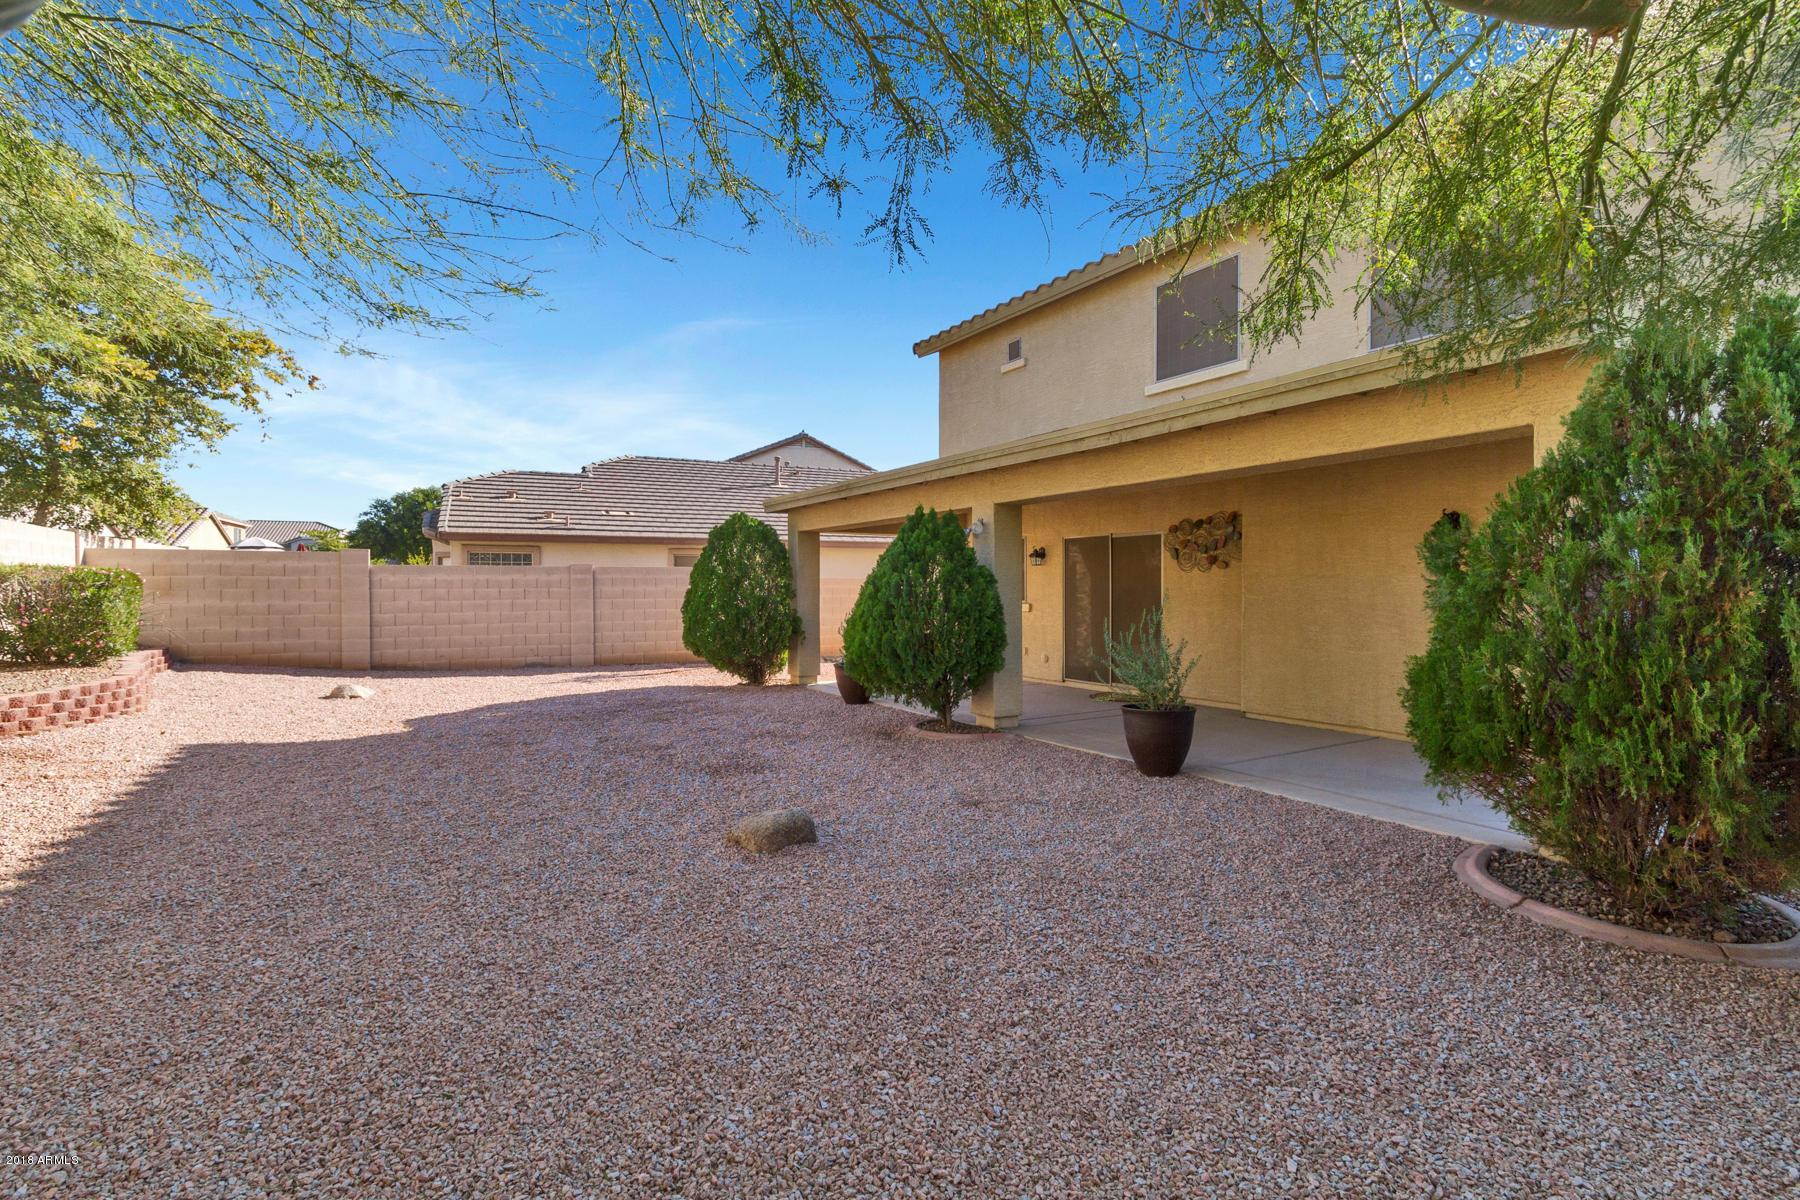 MLS 5831172 7128 W WILLIAMS Street, Phoenix, AZ 85043 Phoenix AZ Sienna Vista